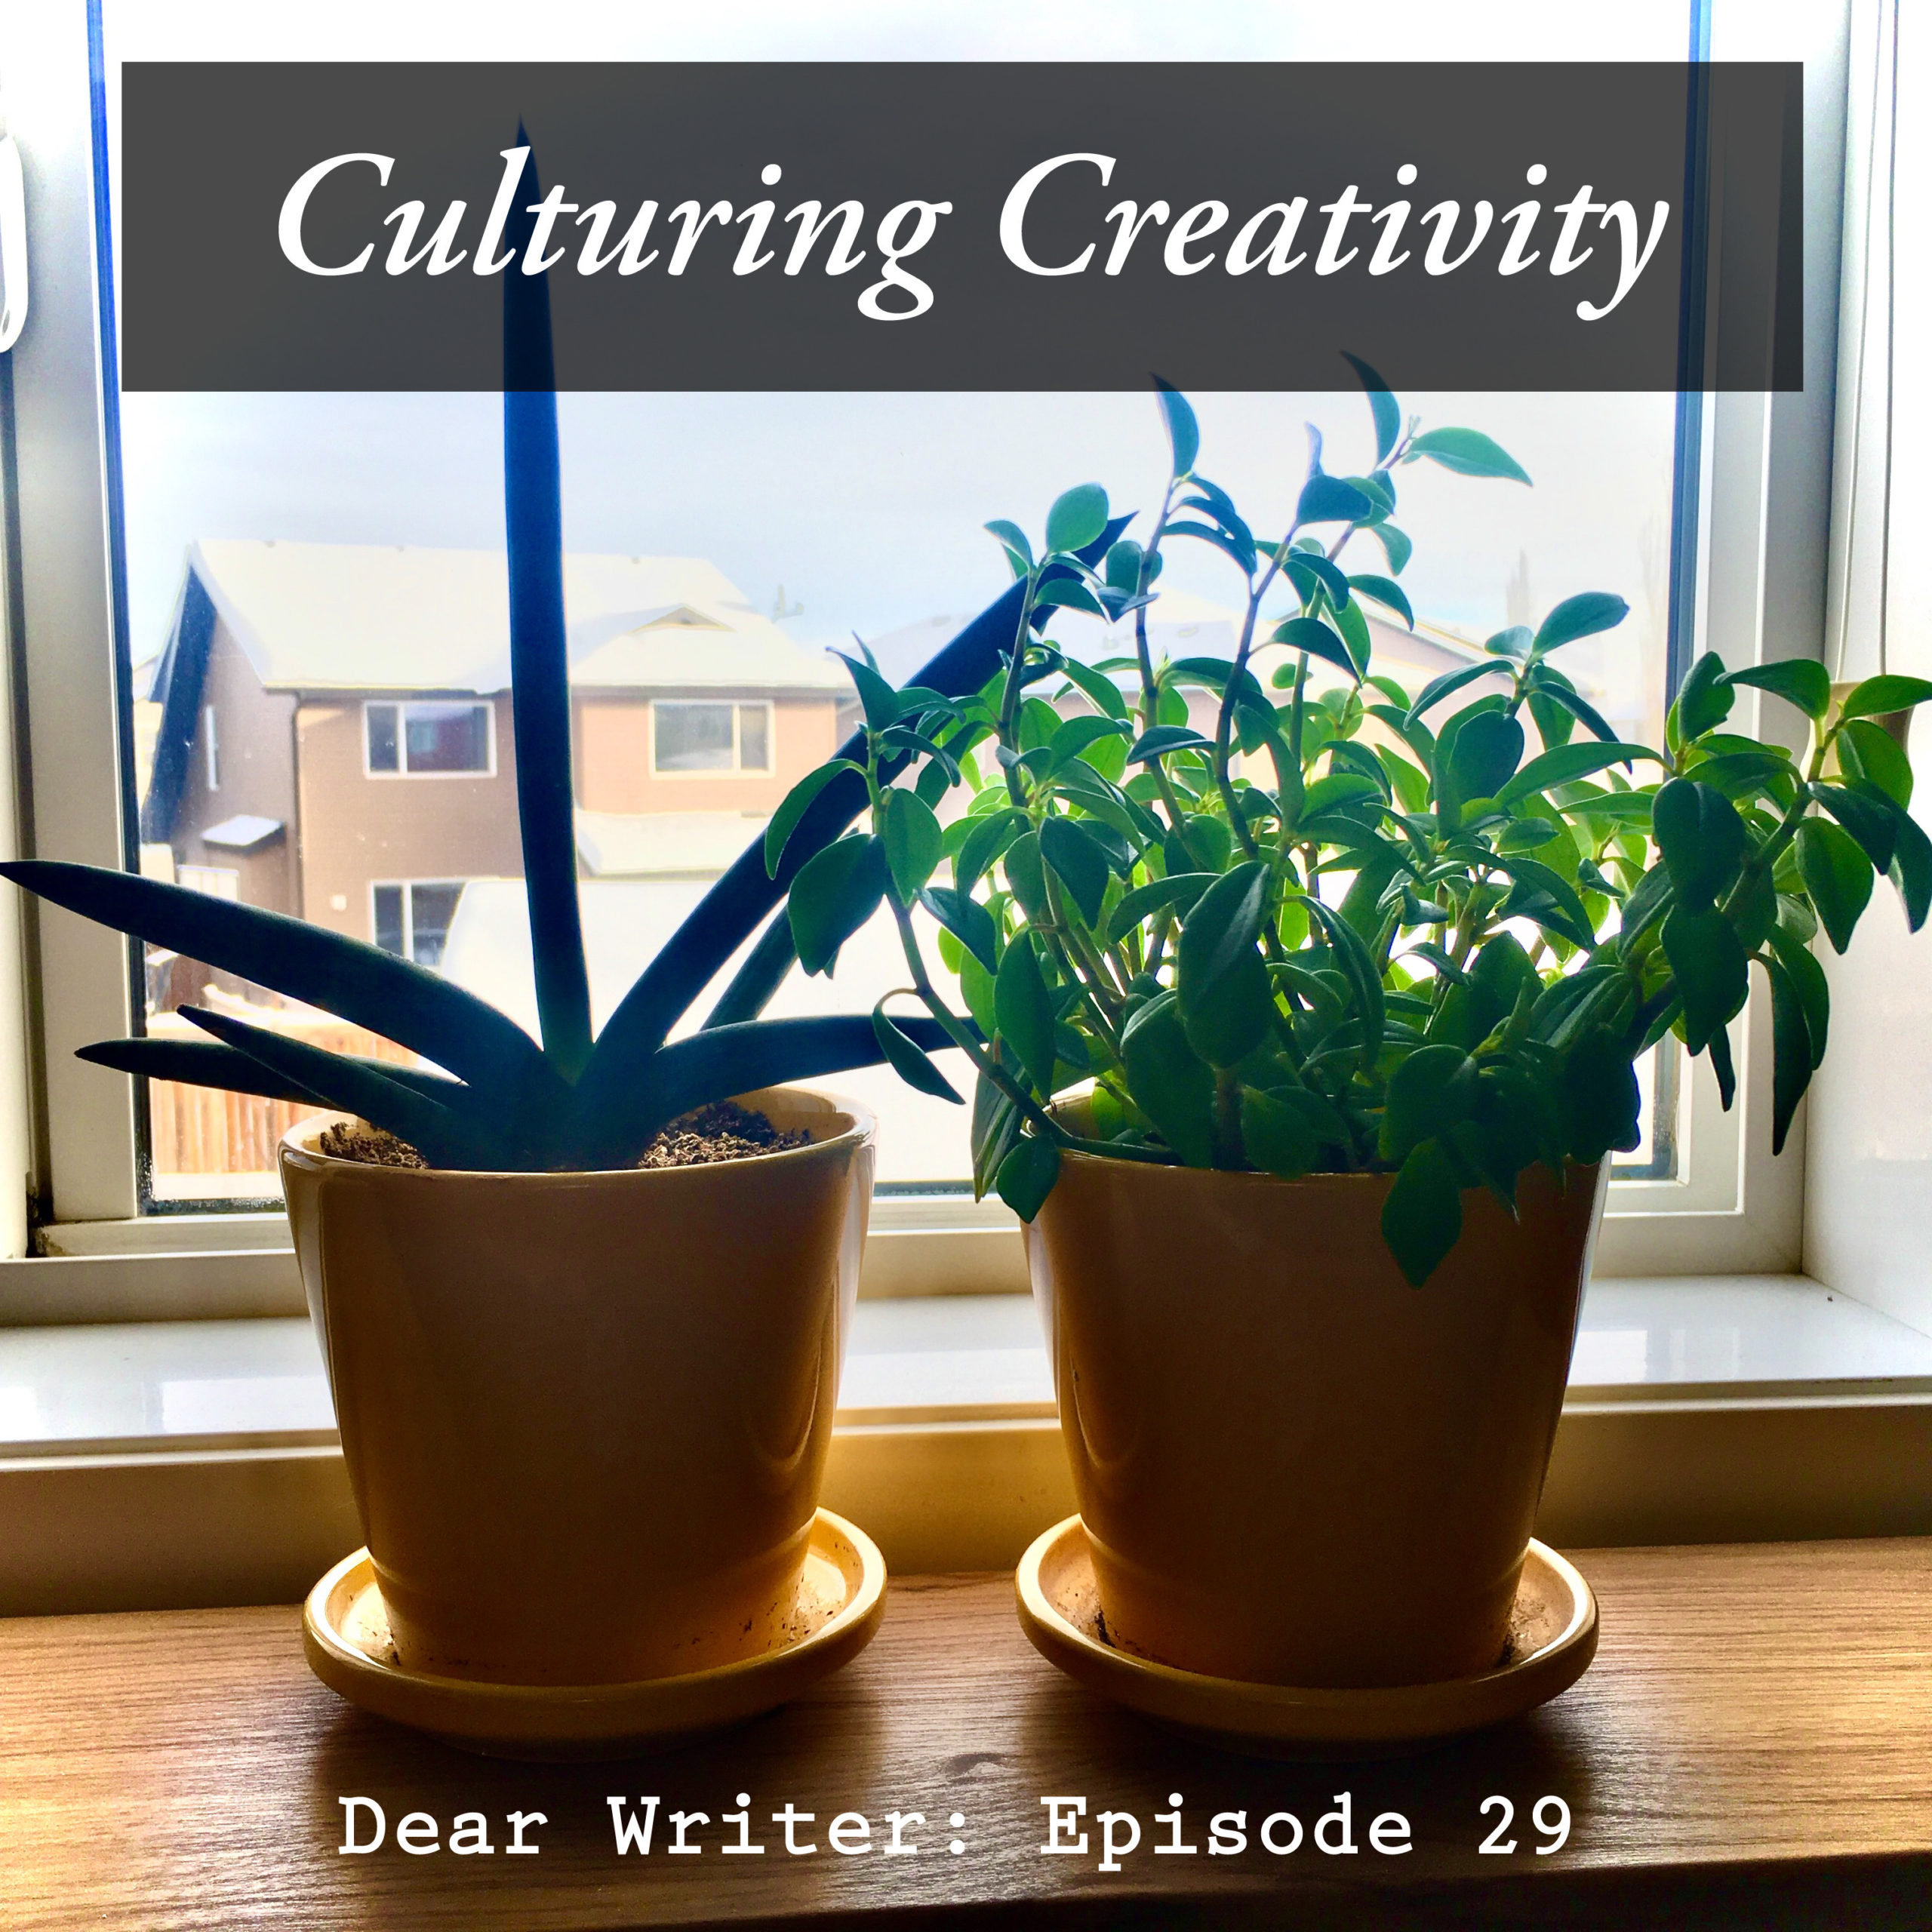 Dear Writer, Episode 29: Culturing Creativity - Music